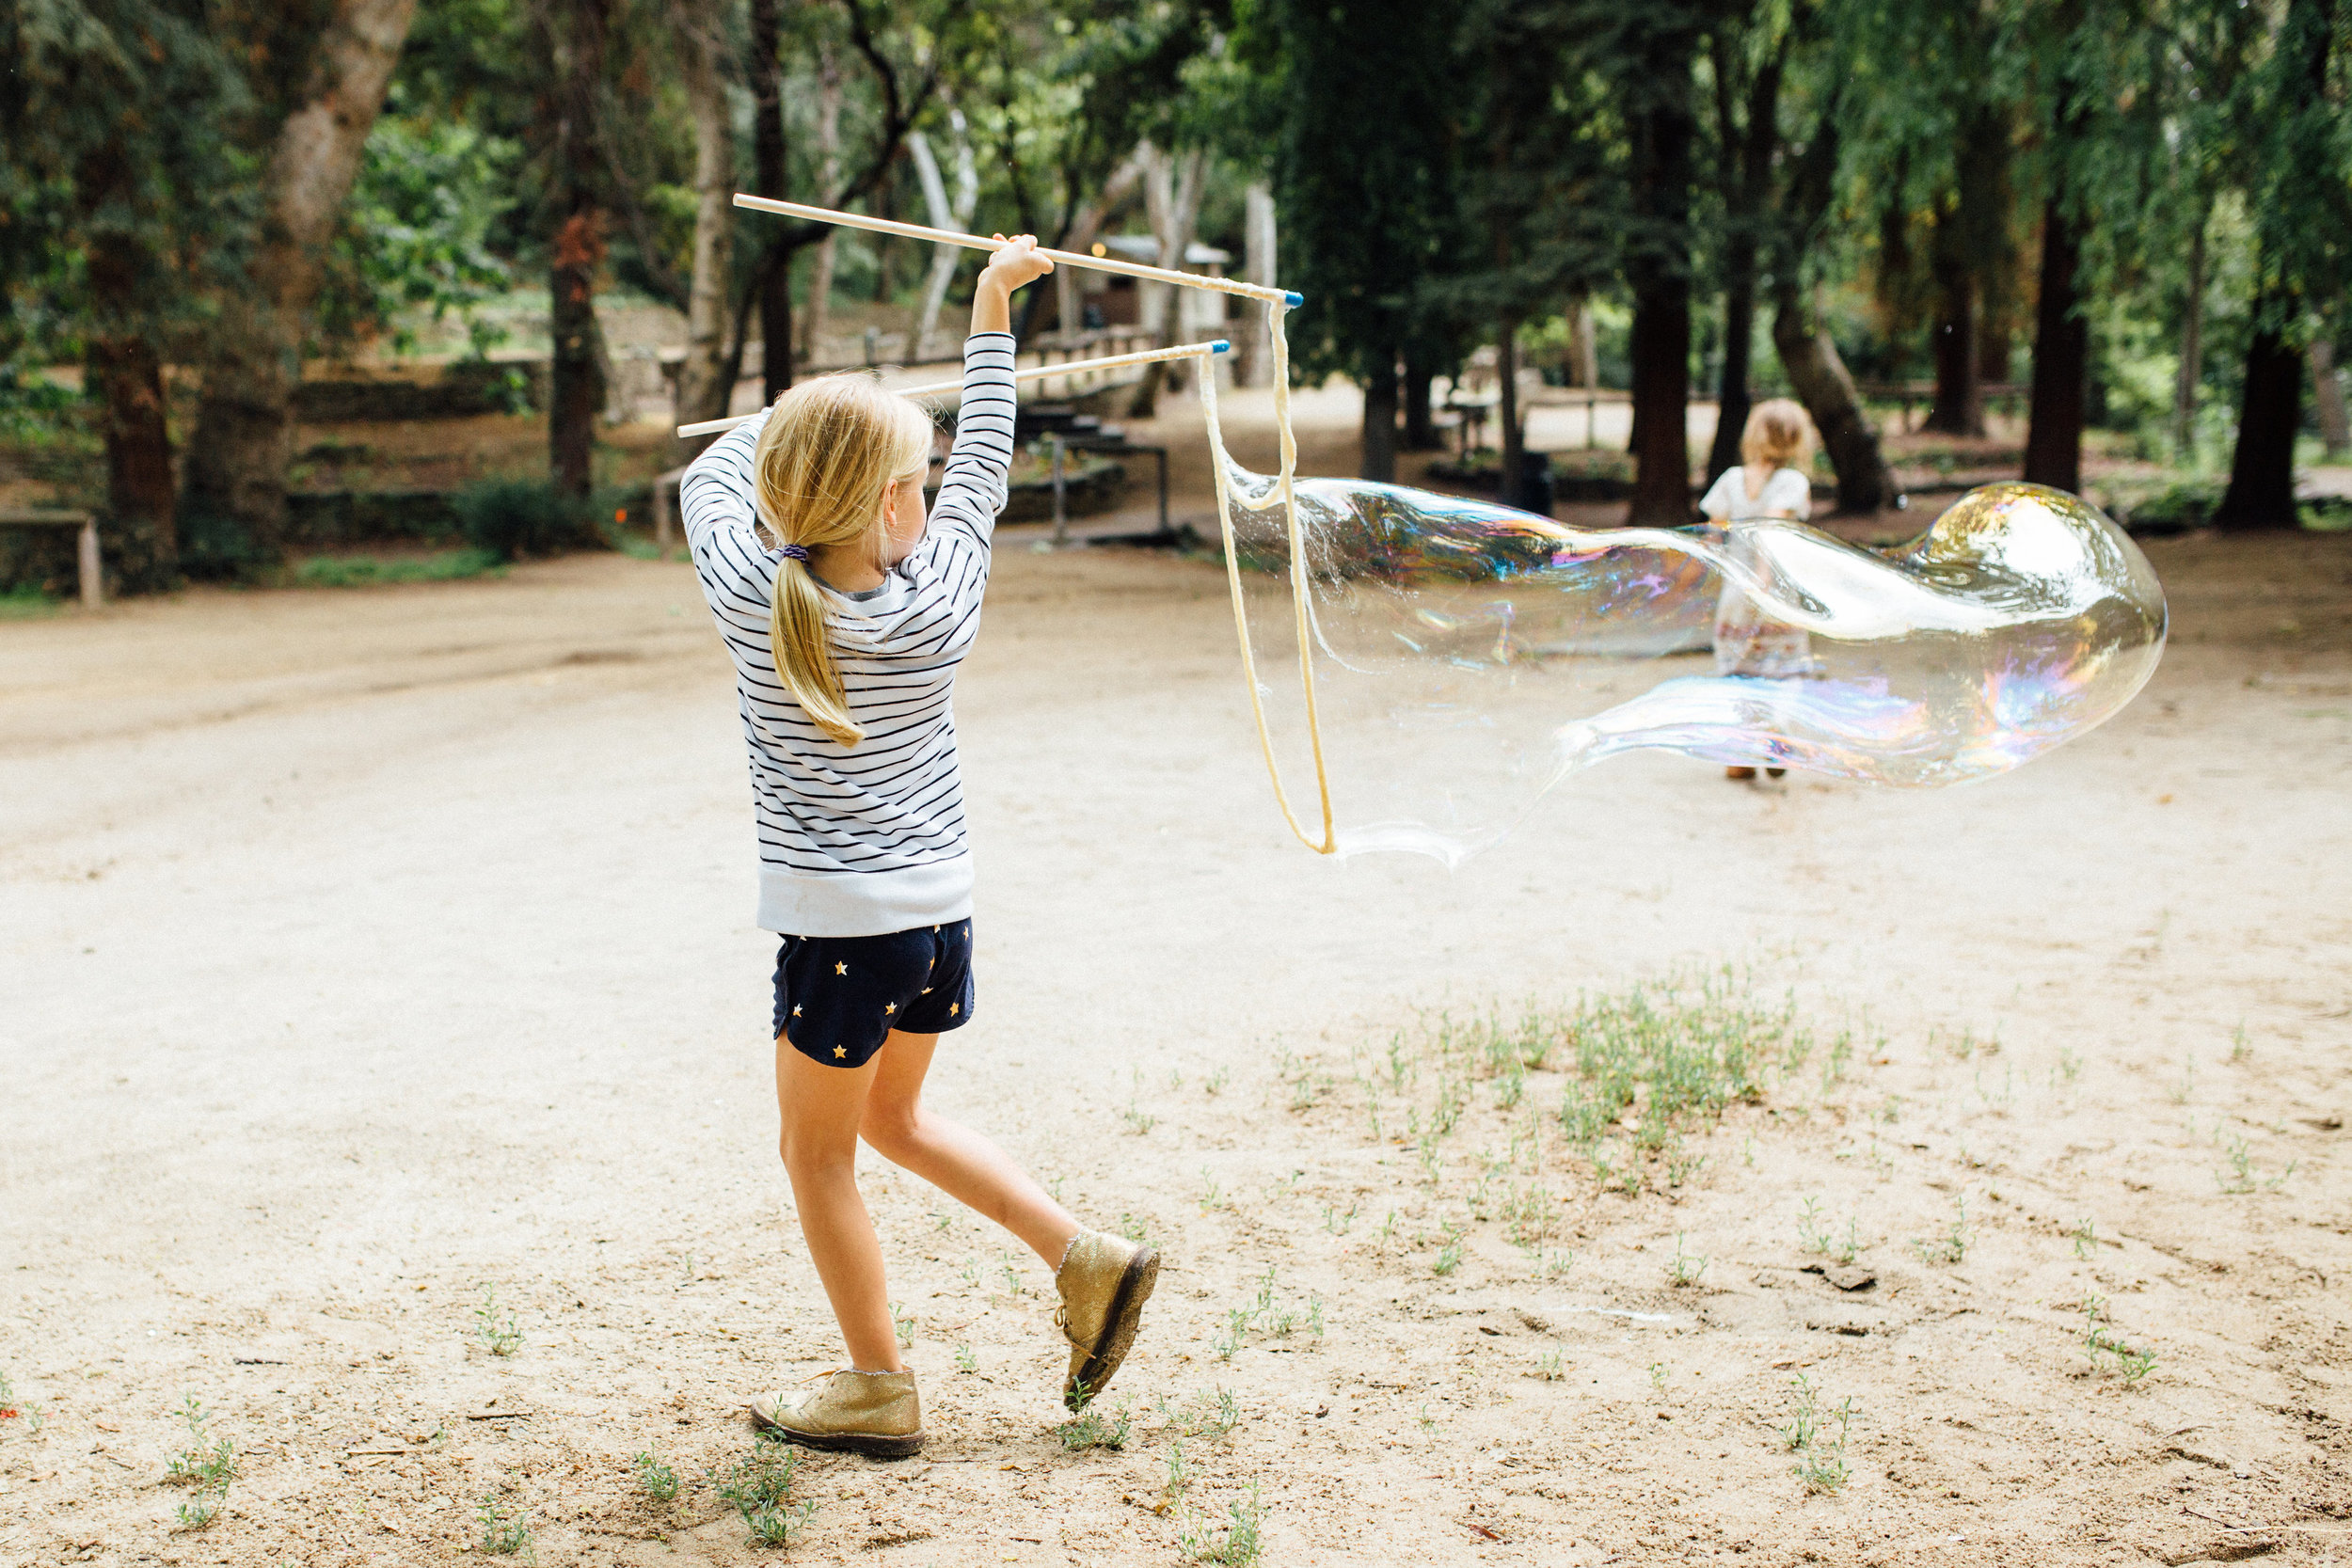 emersons-golden-birthday_nicki-sebastian-photography-175.jpg